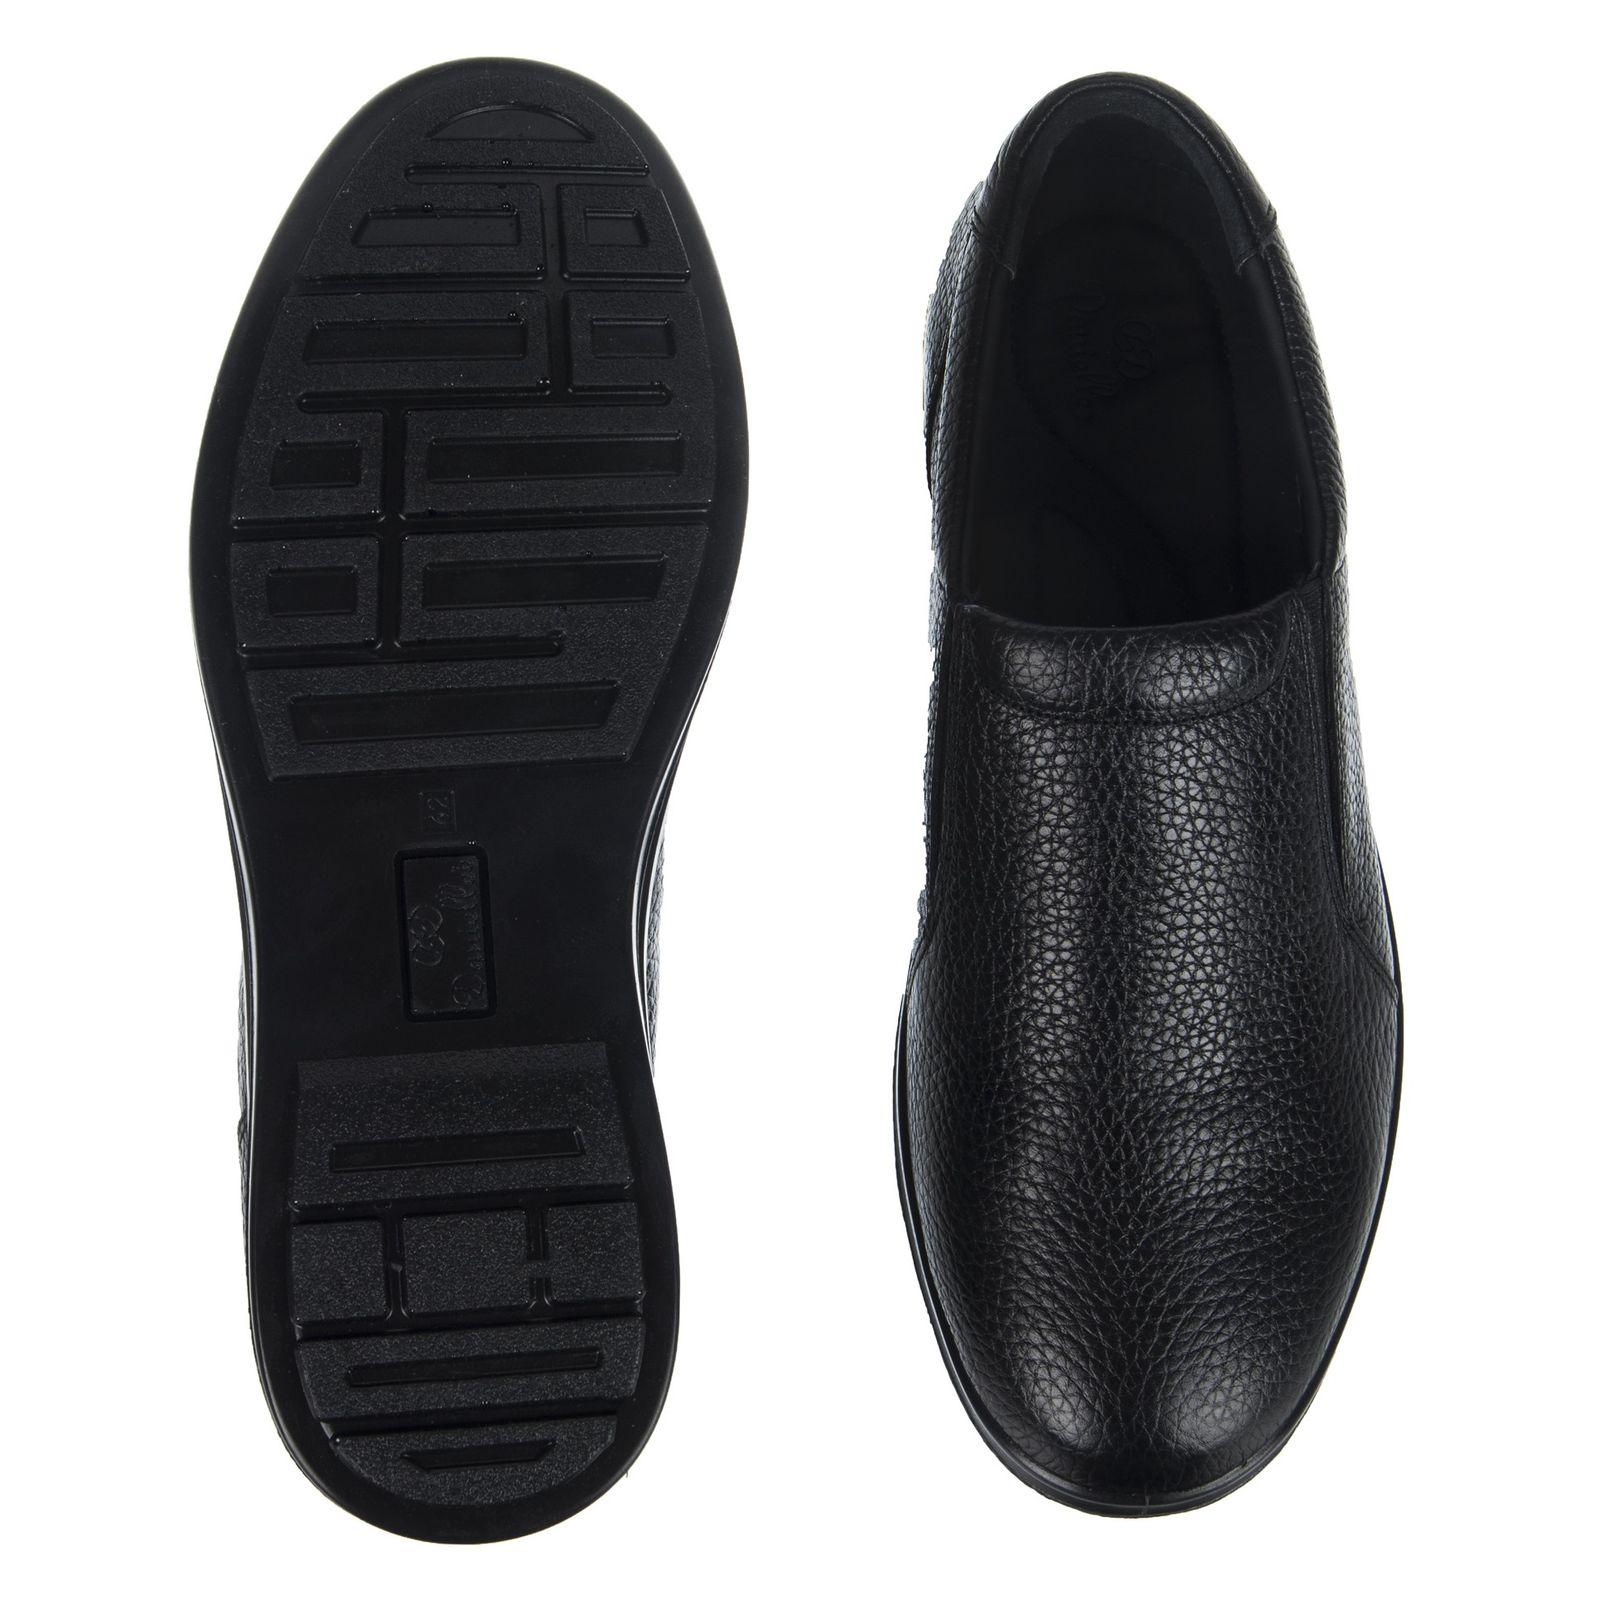 کفش مردانه دنیلی مدل 113110241002 -  - 2